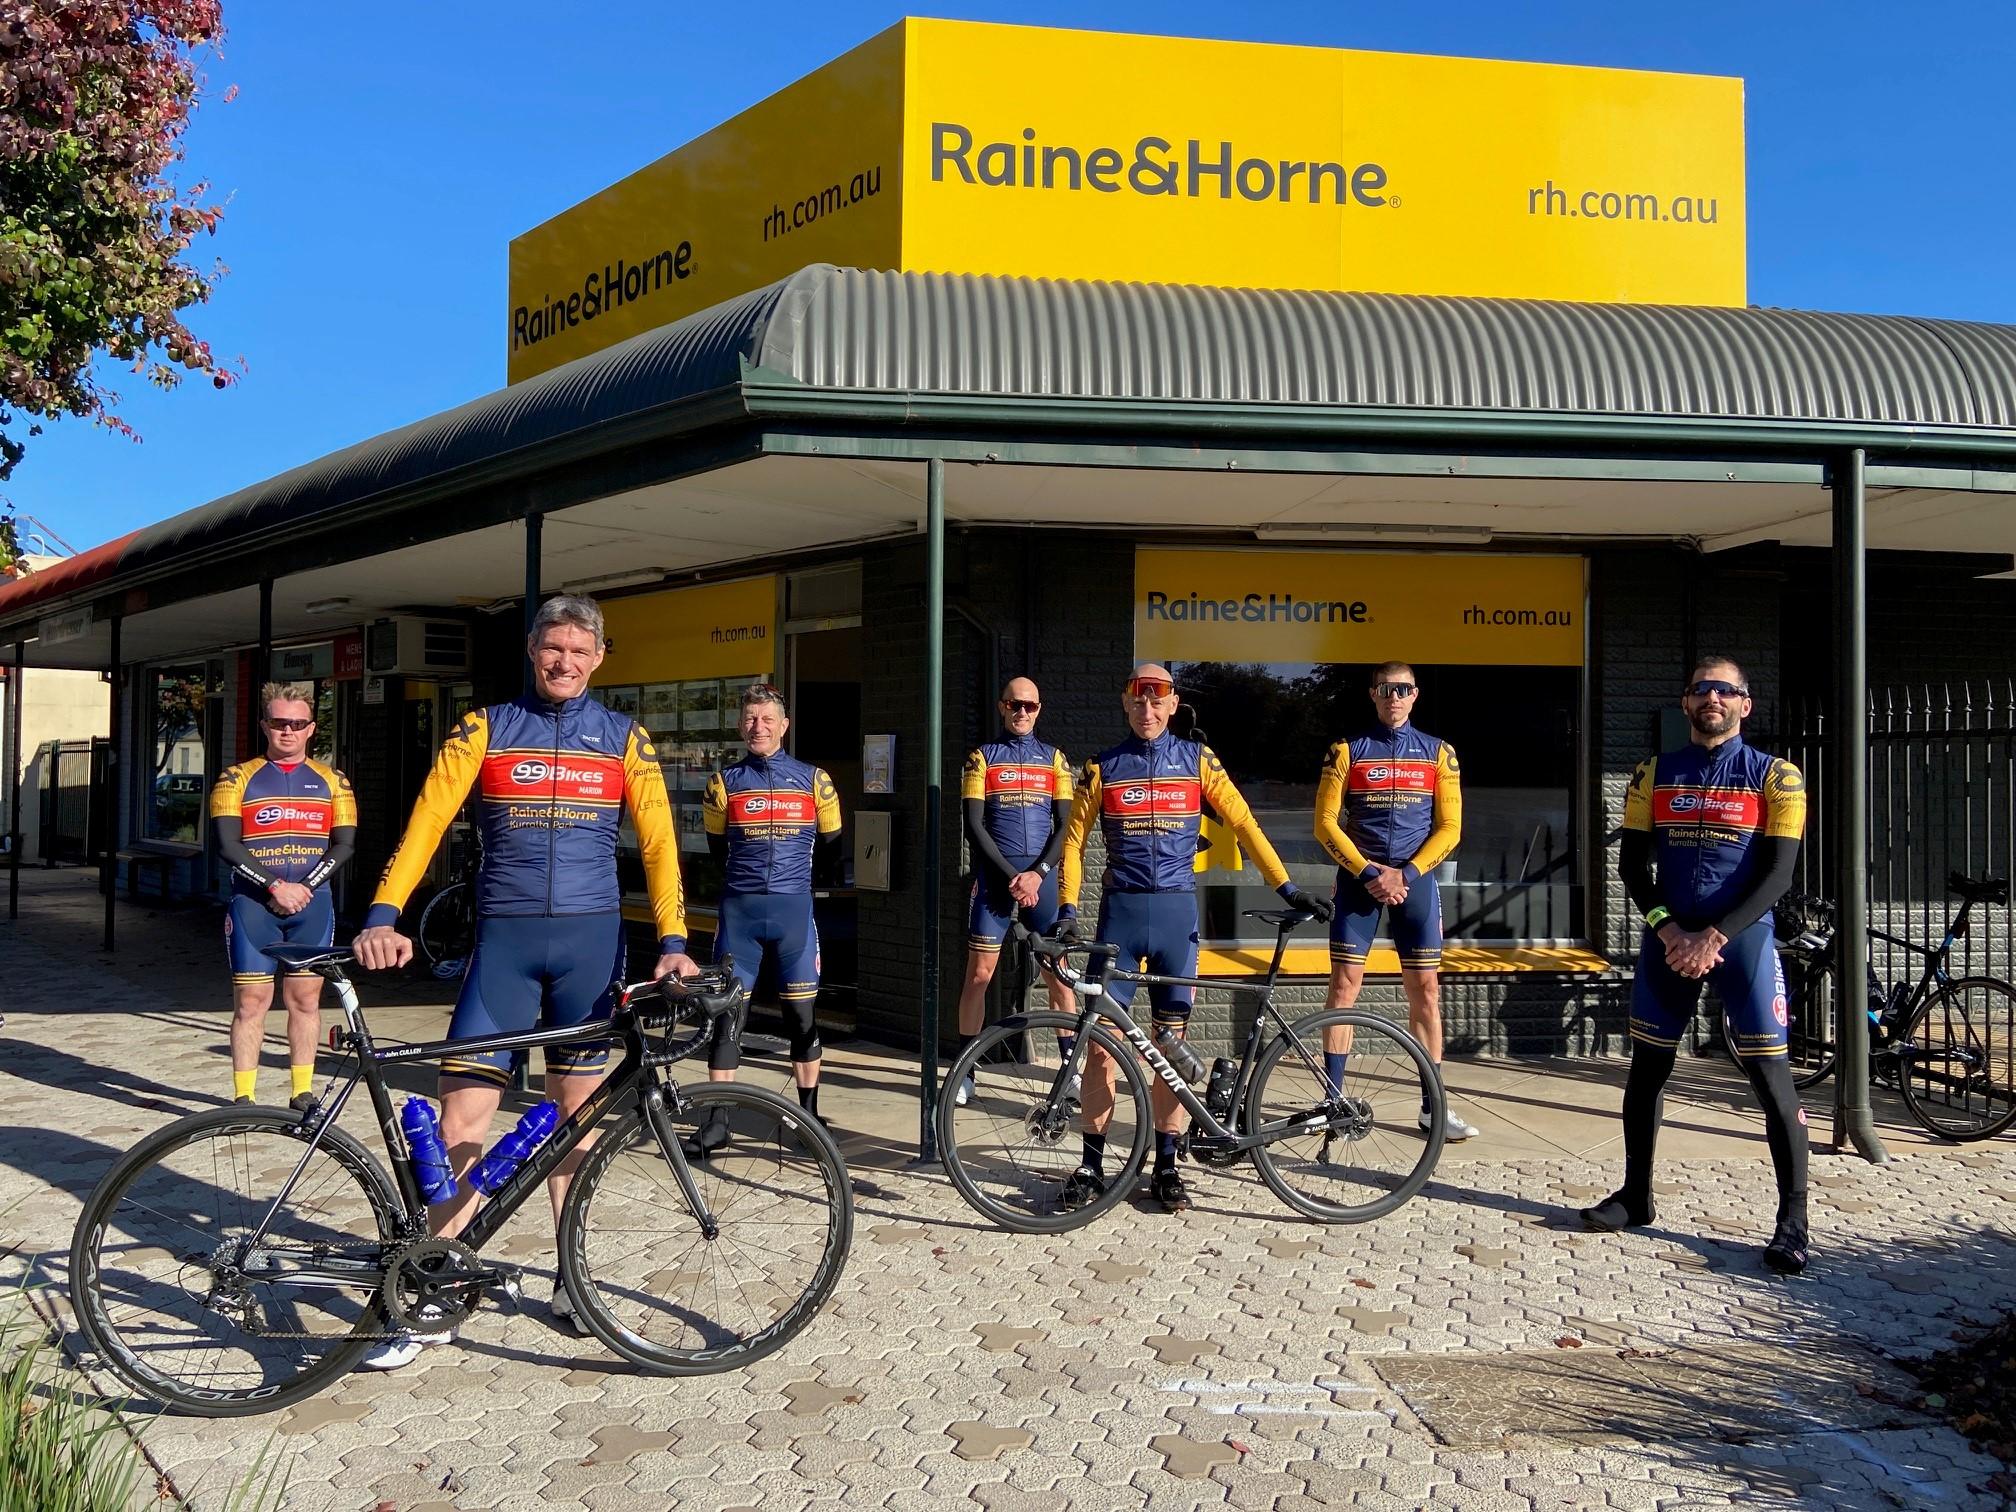 99 Bikes Marion, Raine&Horne Kurralta Park by Tactic Cycling Team